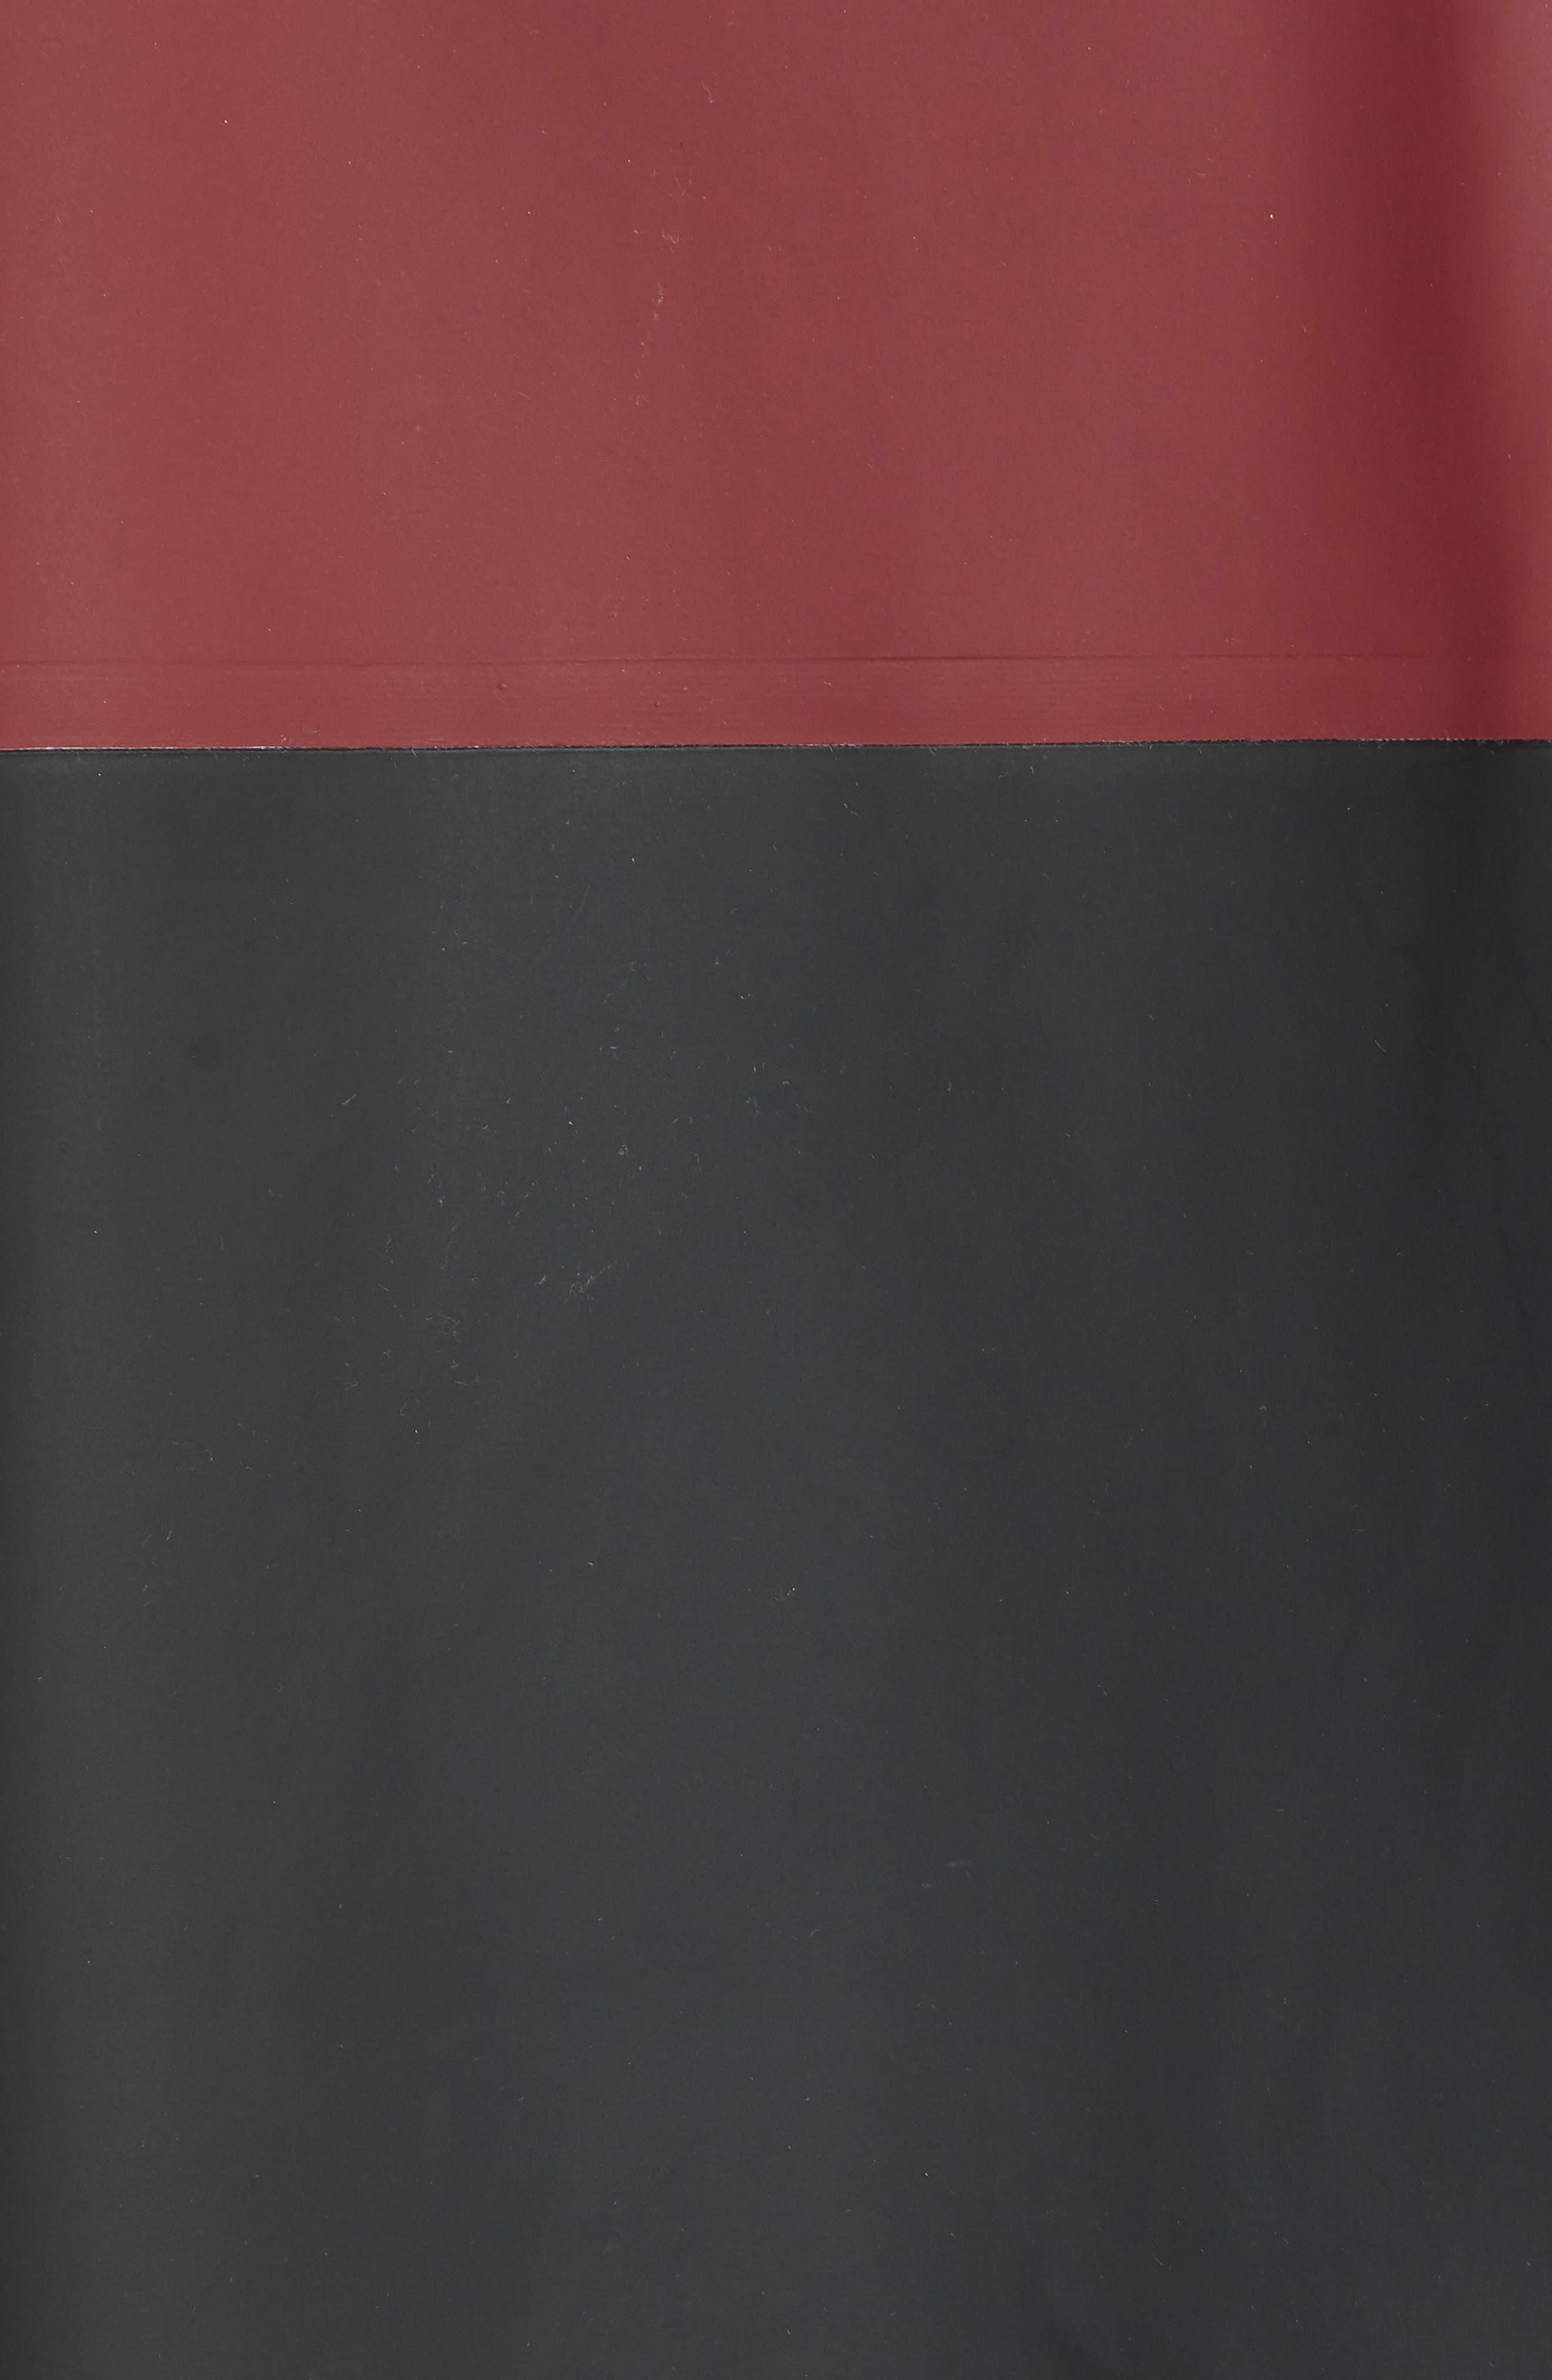 Stockholm Colorblock Waterproof Hooded Raincoat,                             Alternate thumbnail 7, color,                             BURGUNDY/ BLACK